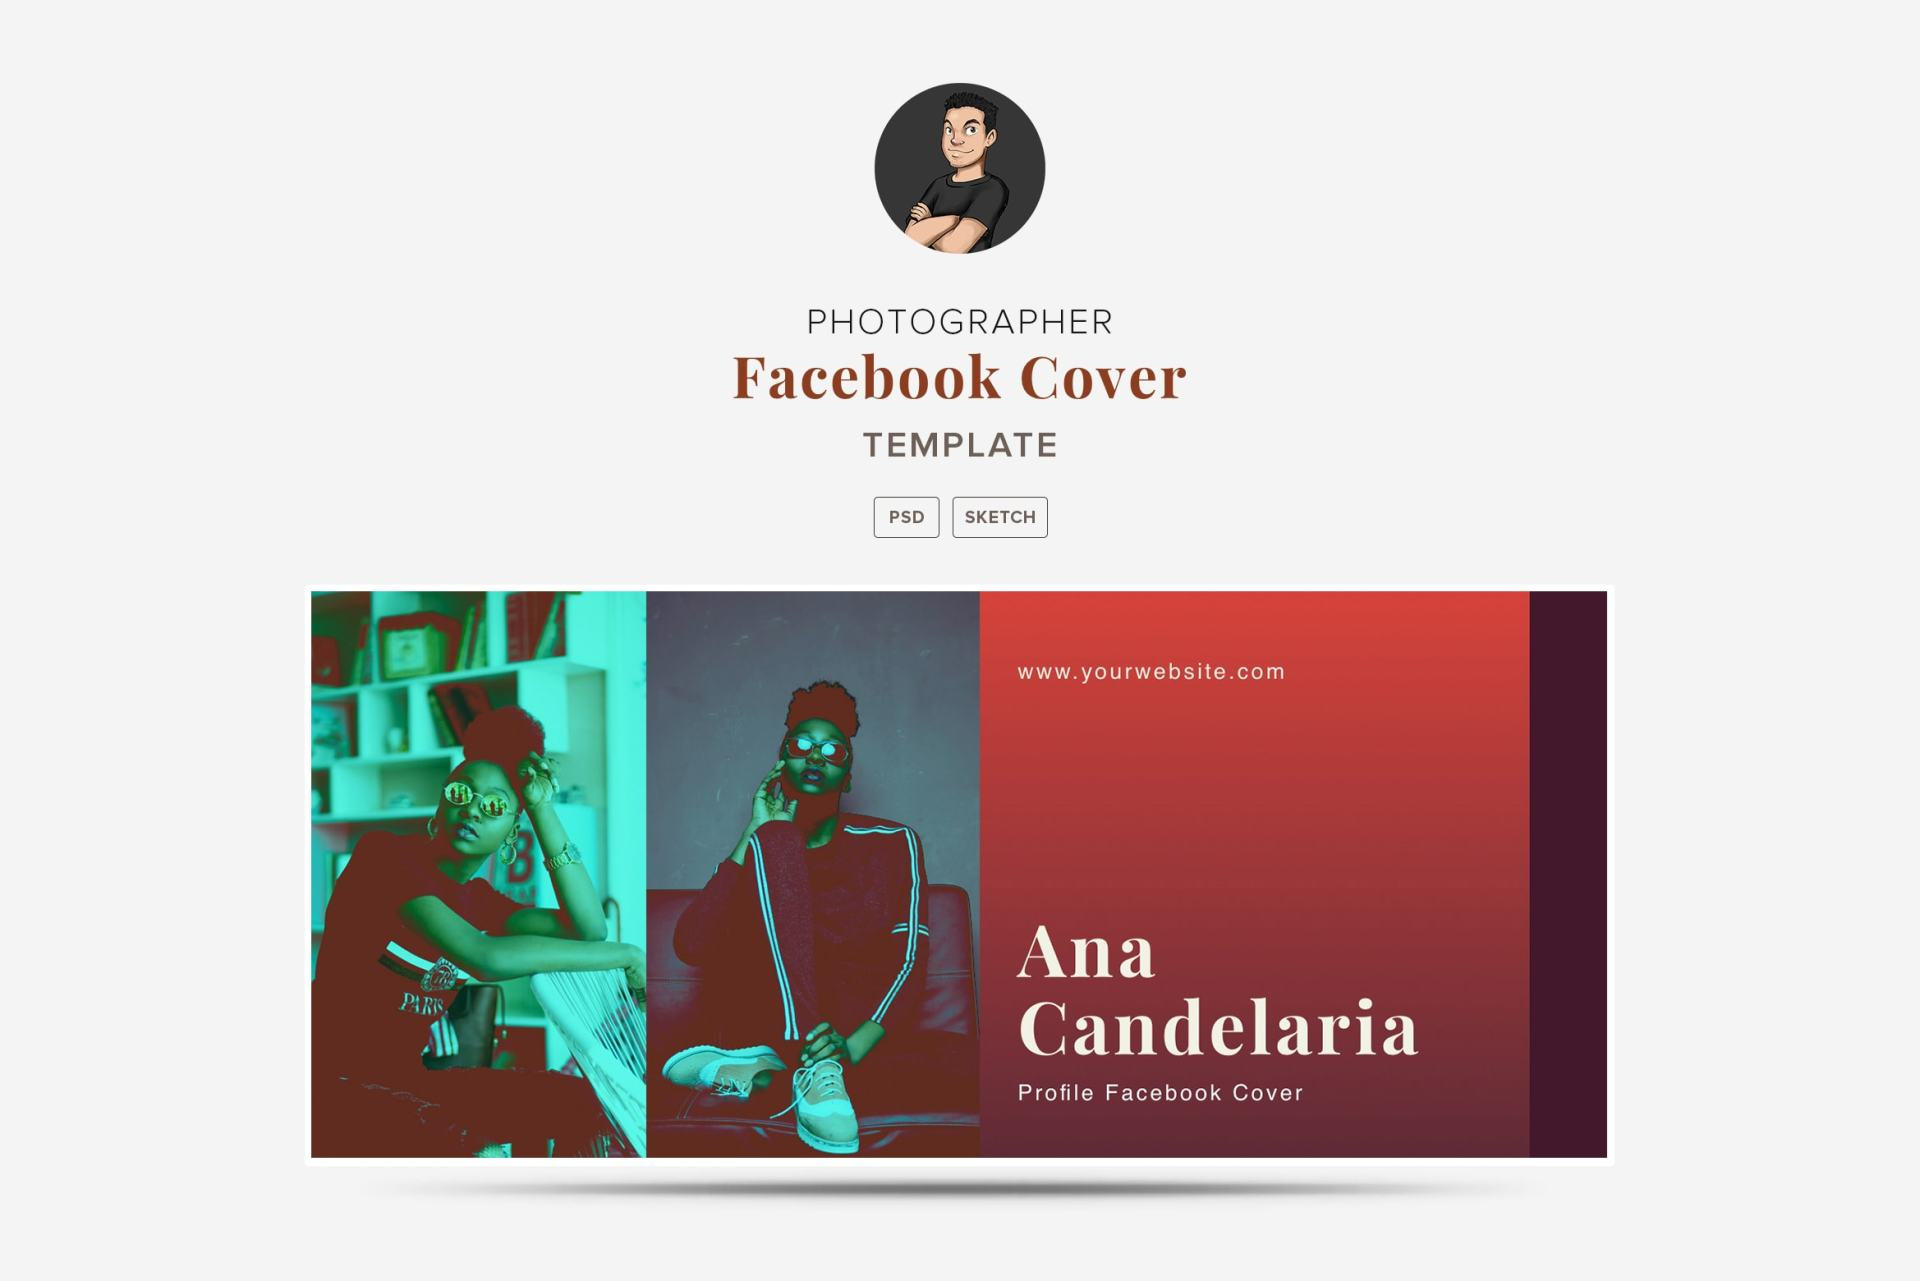 Photographer Facebook Cover Template